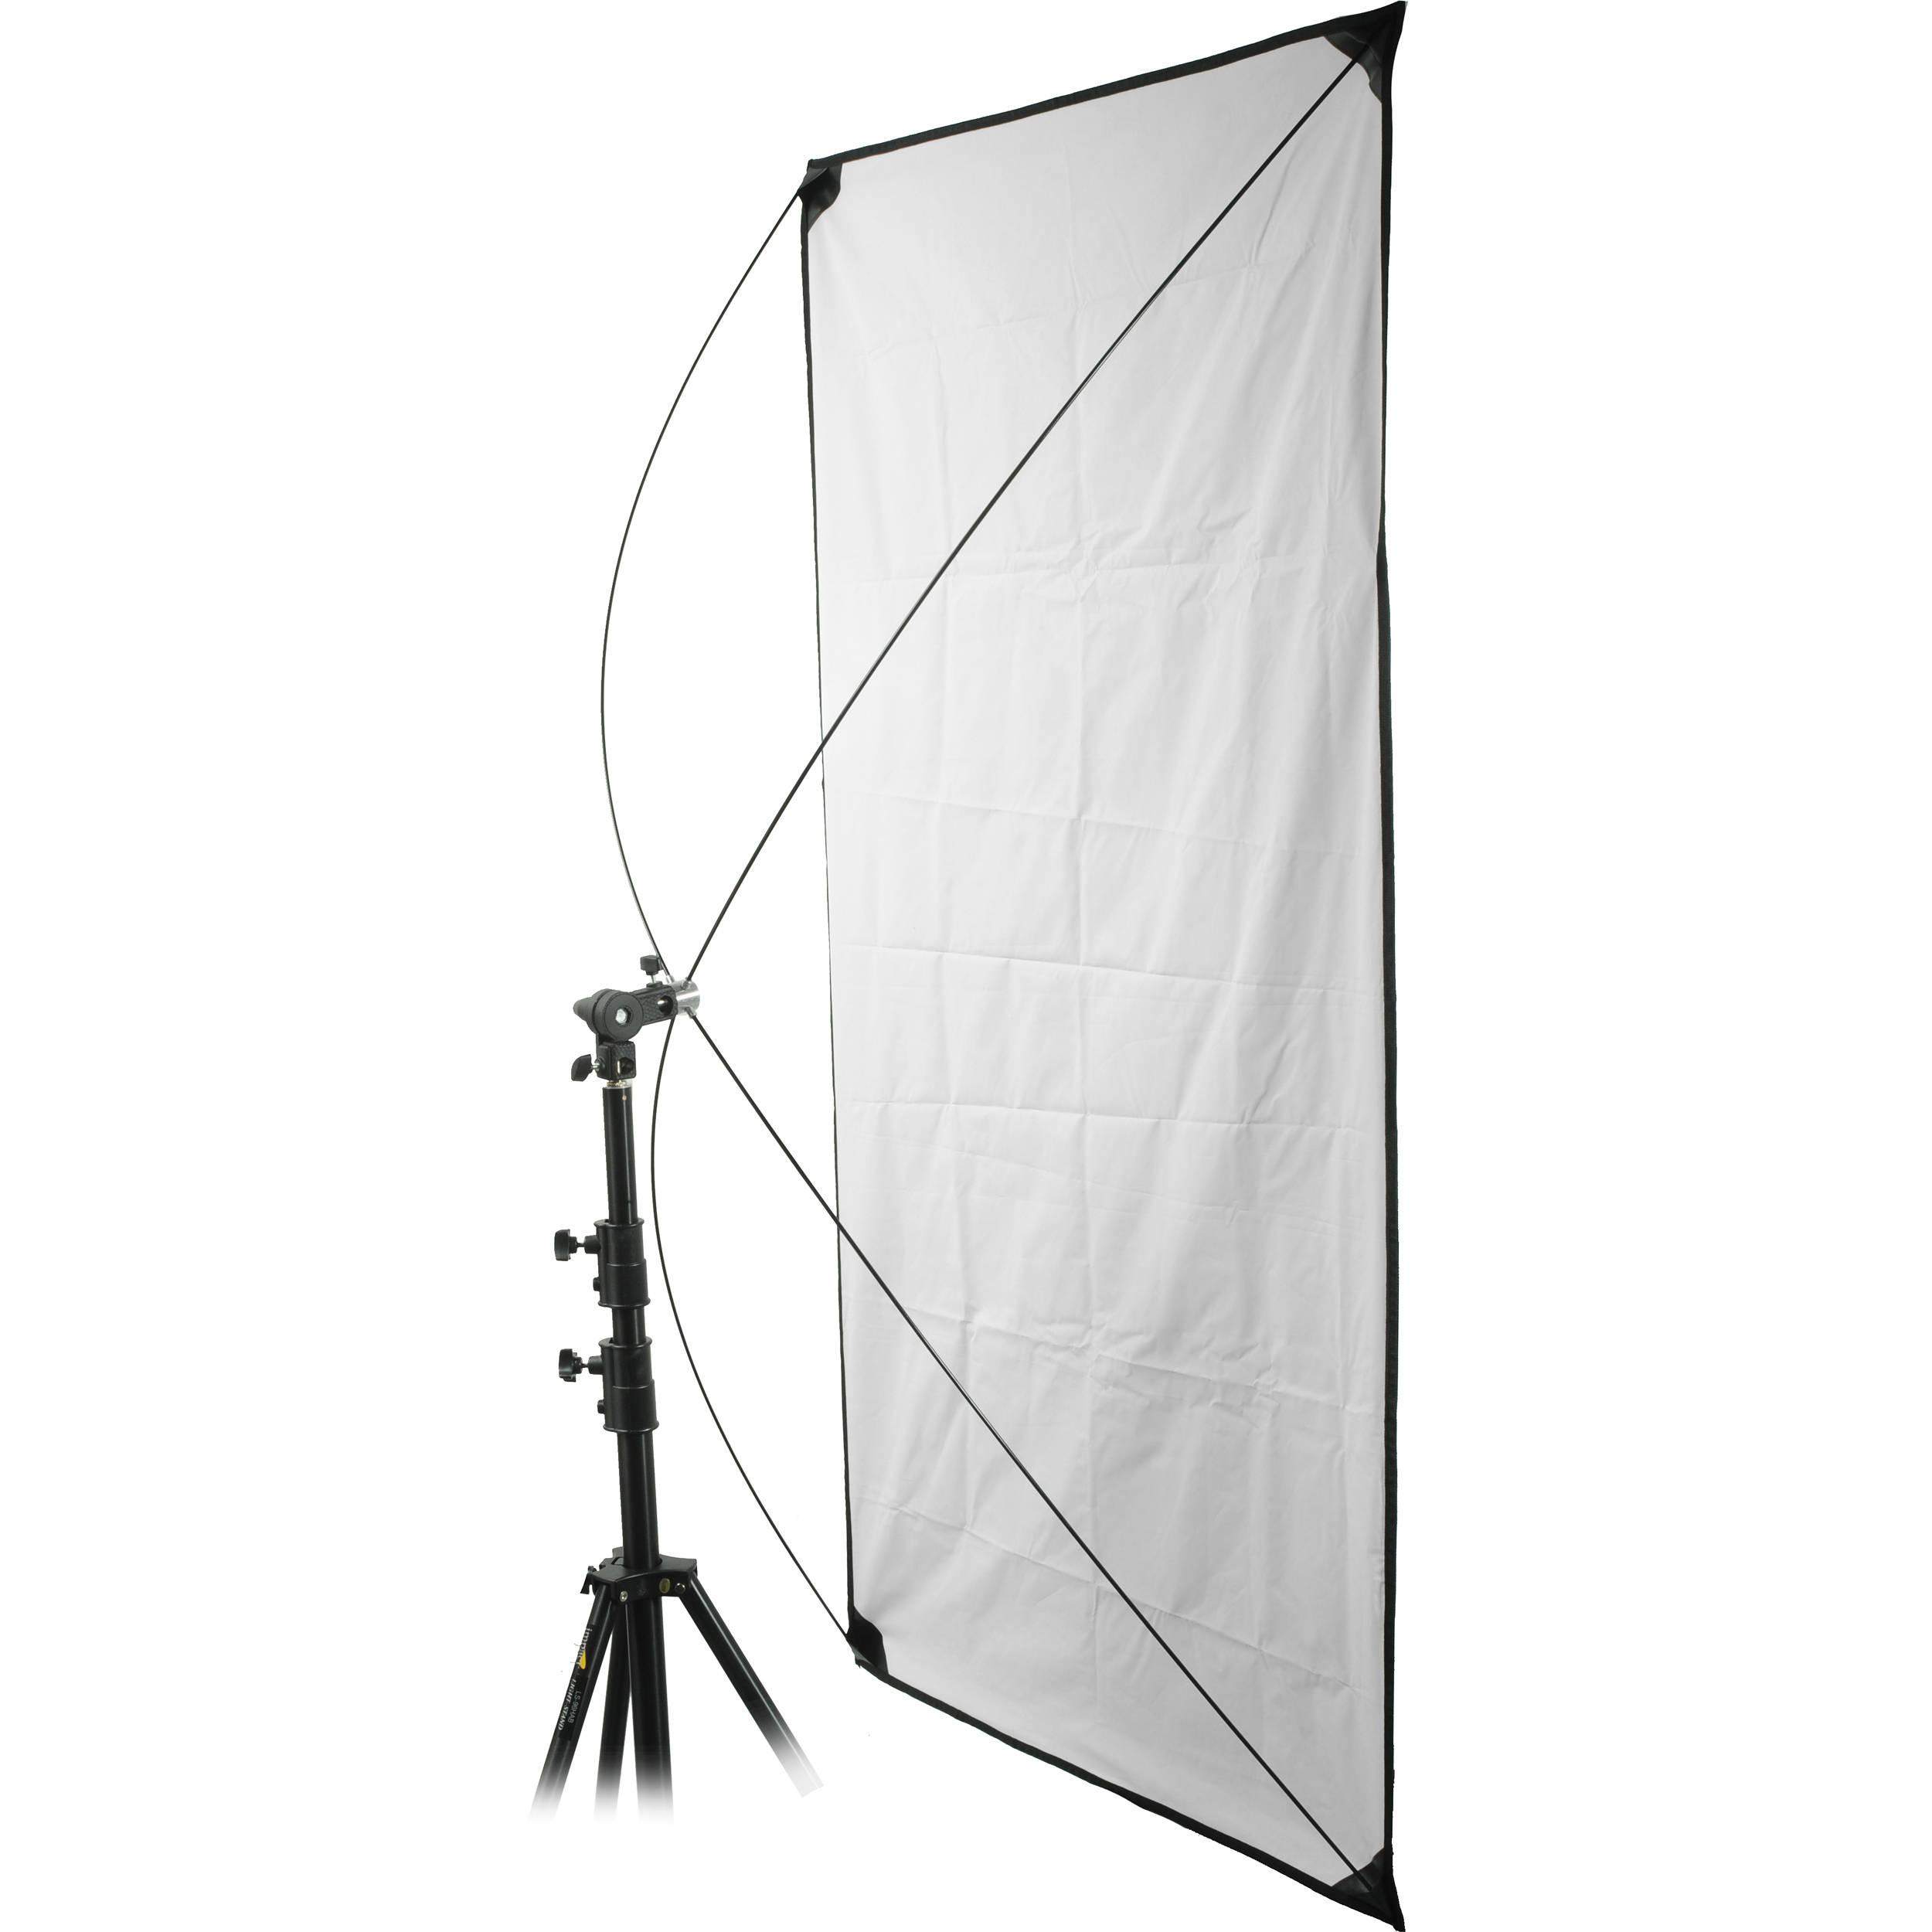 "Studio Lighting Cheap: Impact Reflector Panel 35 X 70"" (90 X 179 Cm) RP-3570 B&H"